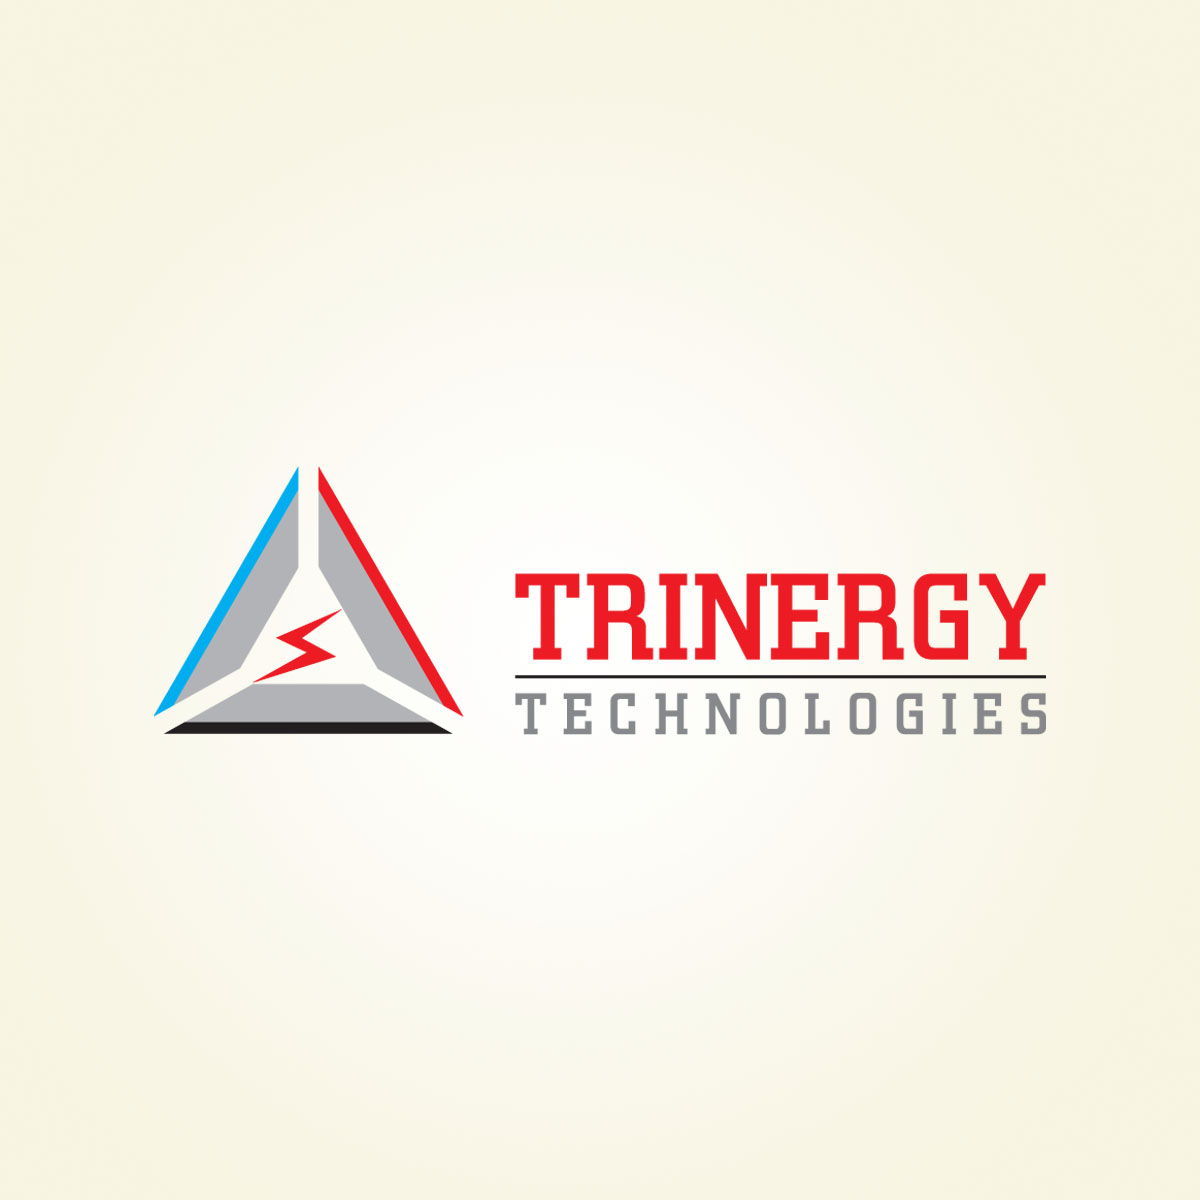 Trinergy Technologies